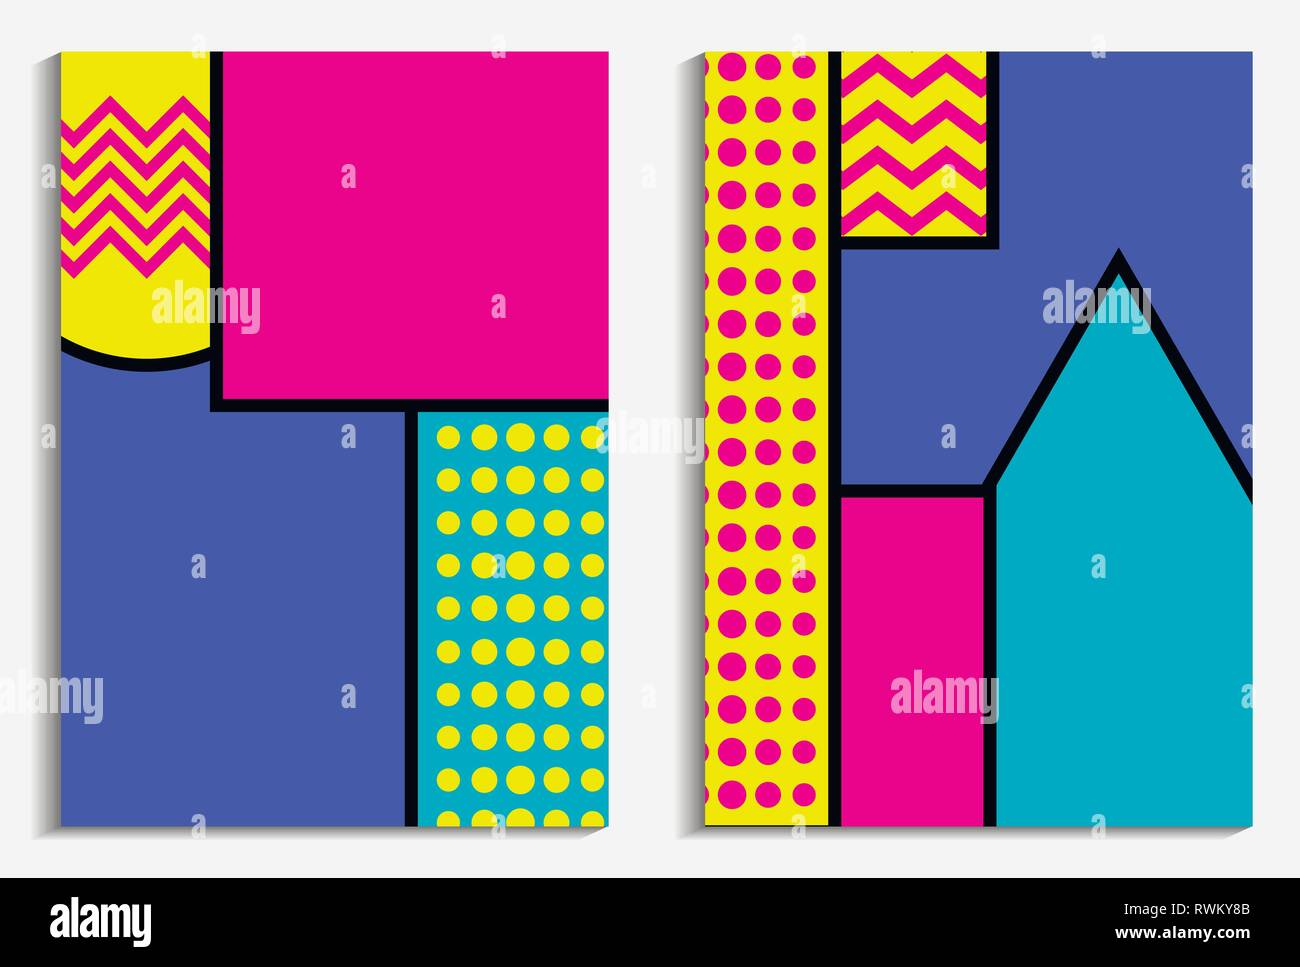 Memphis Poster Set. Geometrische Elemente im Stil der 80er Jahre. Vector Illustration Stockbild